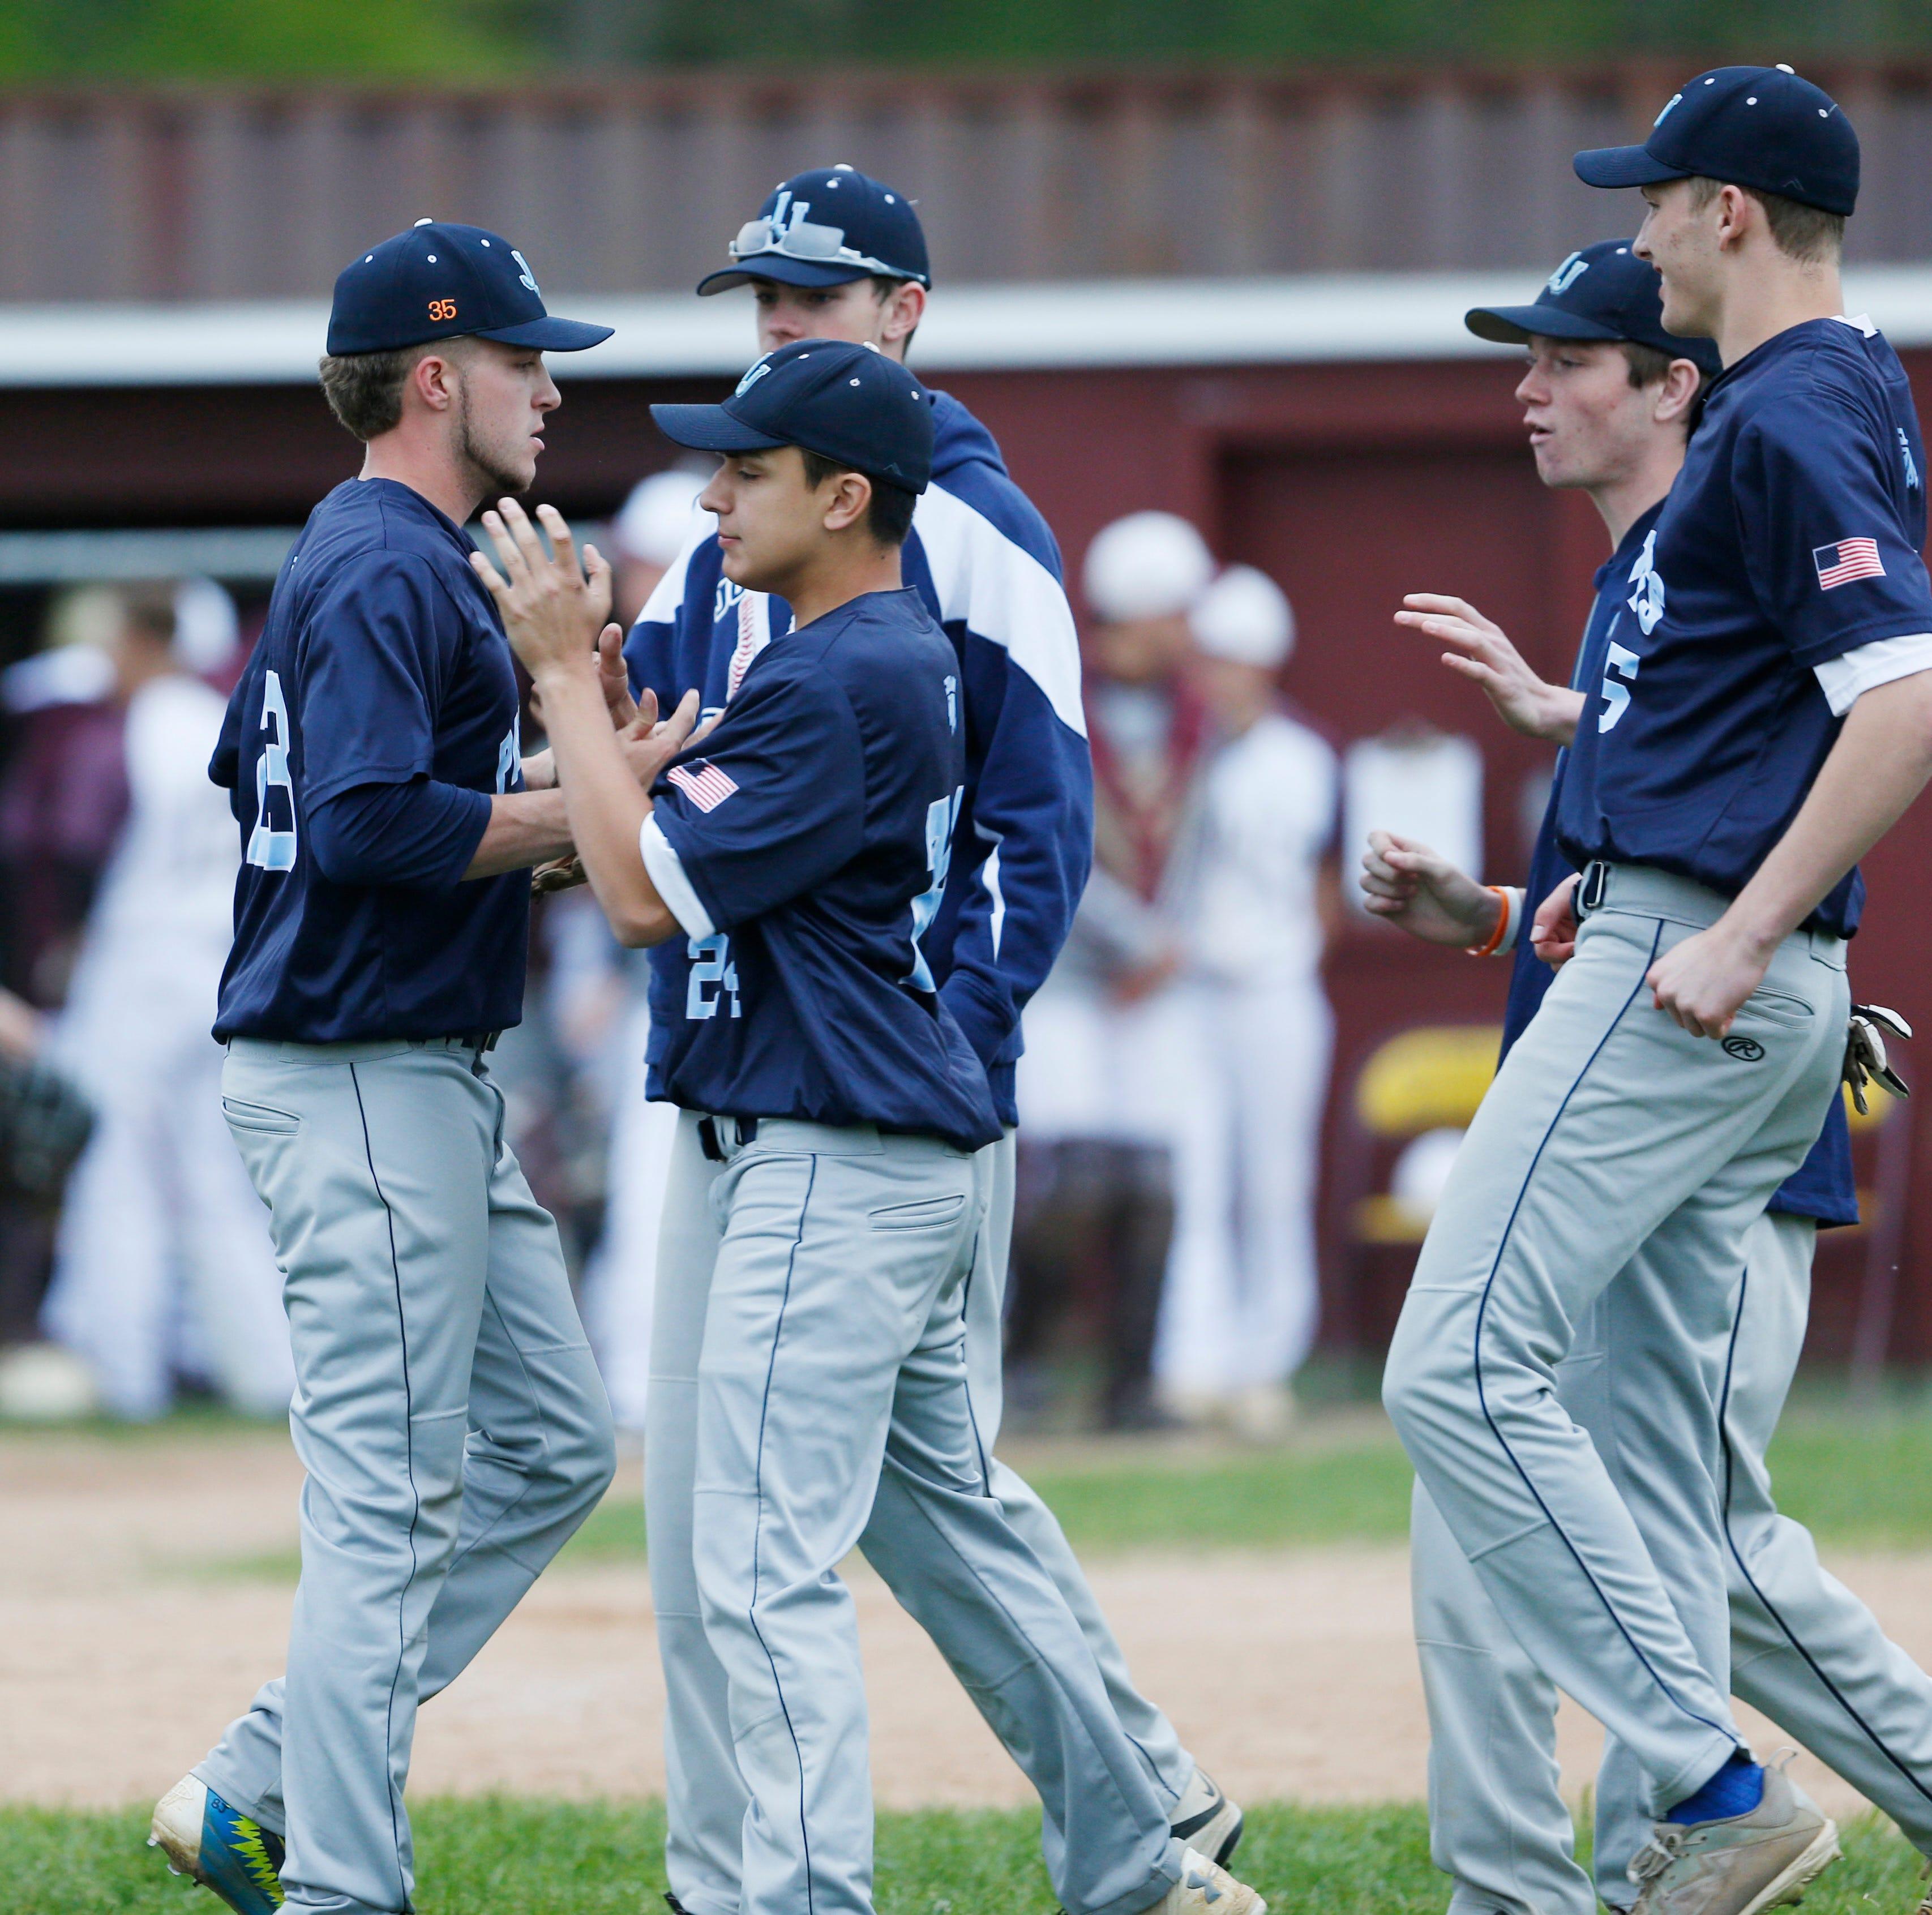 Baseball: John Jay edges Arlington as playoffs loom